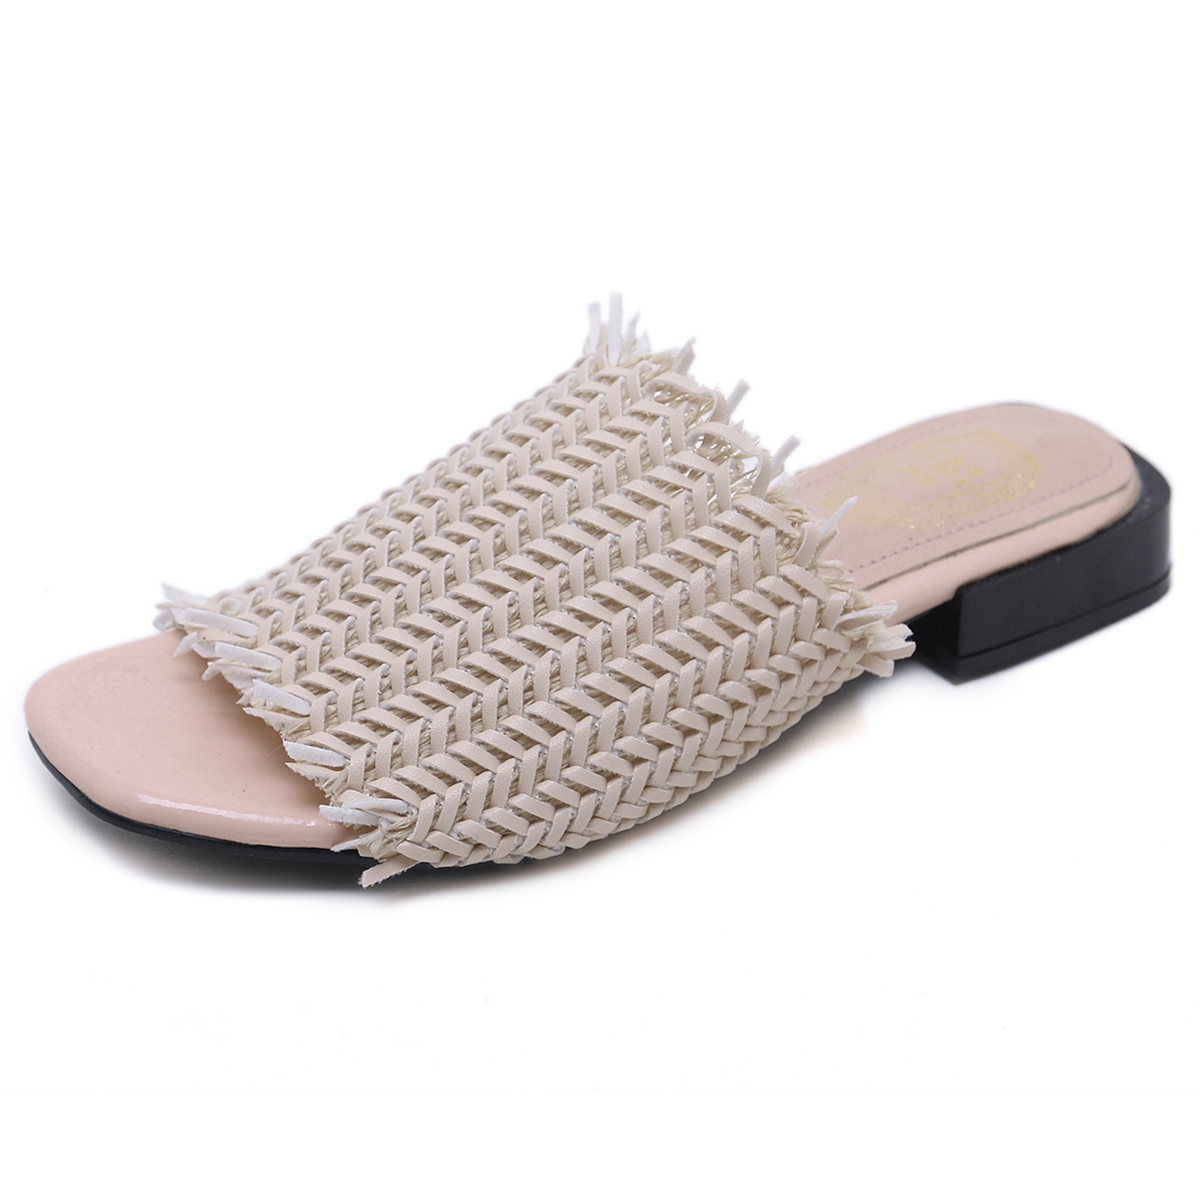 4395f561b9d6 Designer shoes European and American fashion slipper straw flat lazy ...